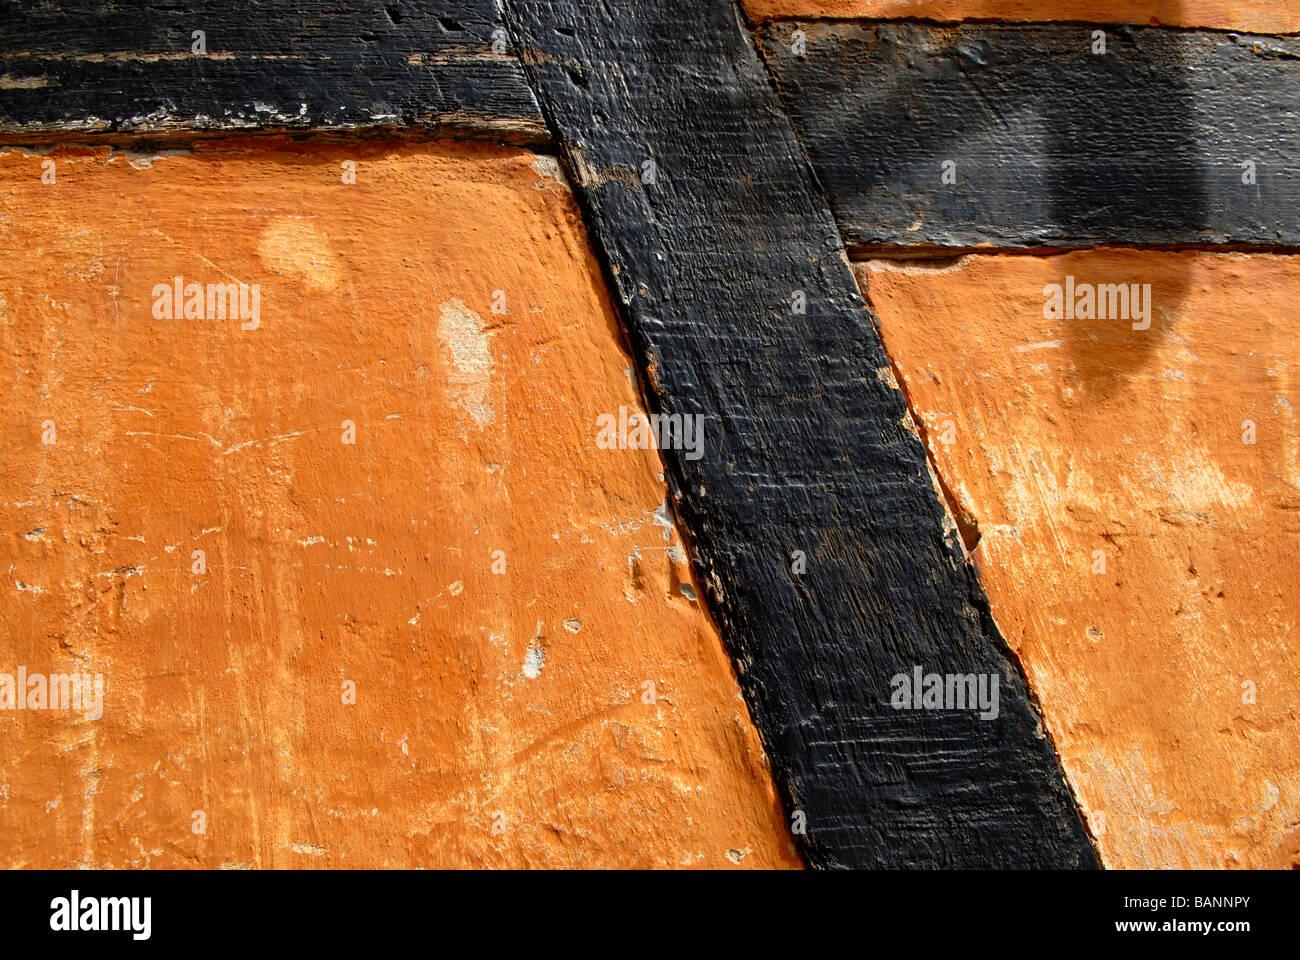 HALF-TIMBERED FACADE - Stock Image